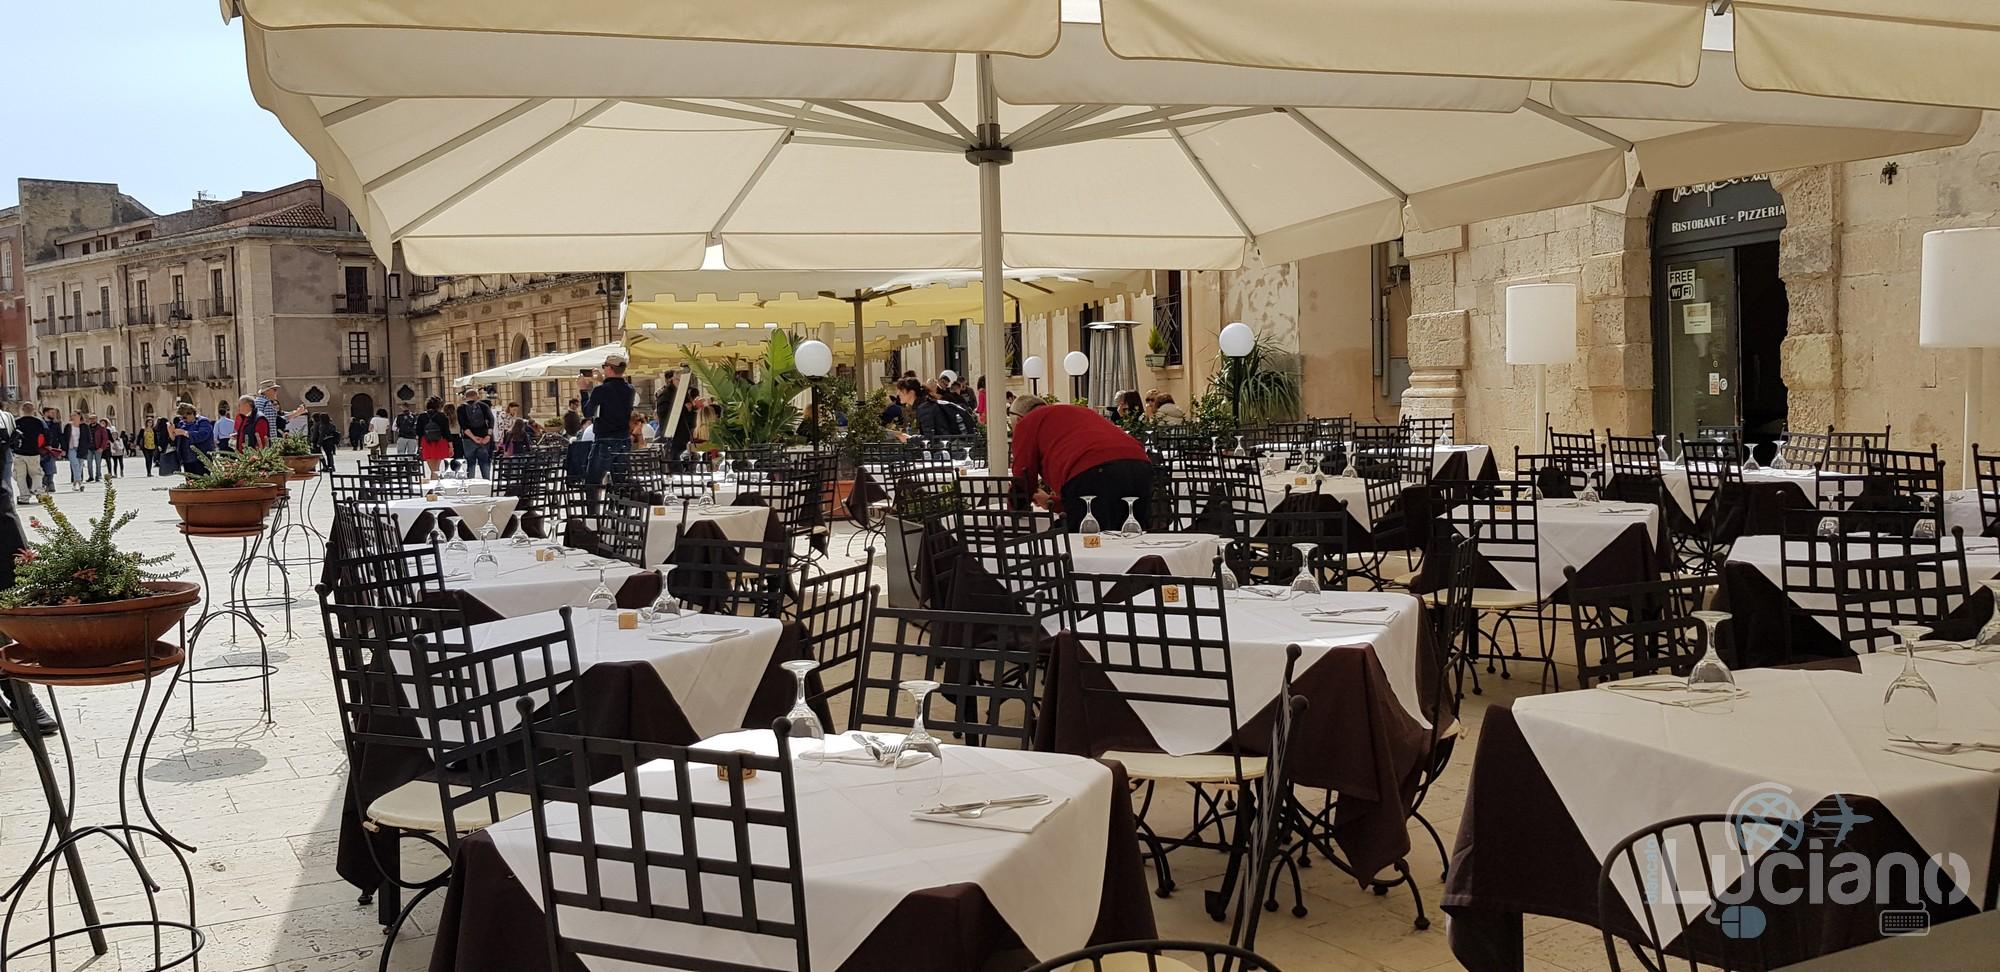 Siracusa - Bar in piazza del Duomo Ortigia